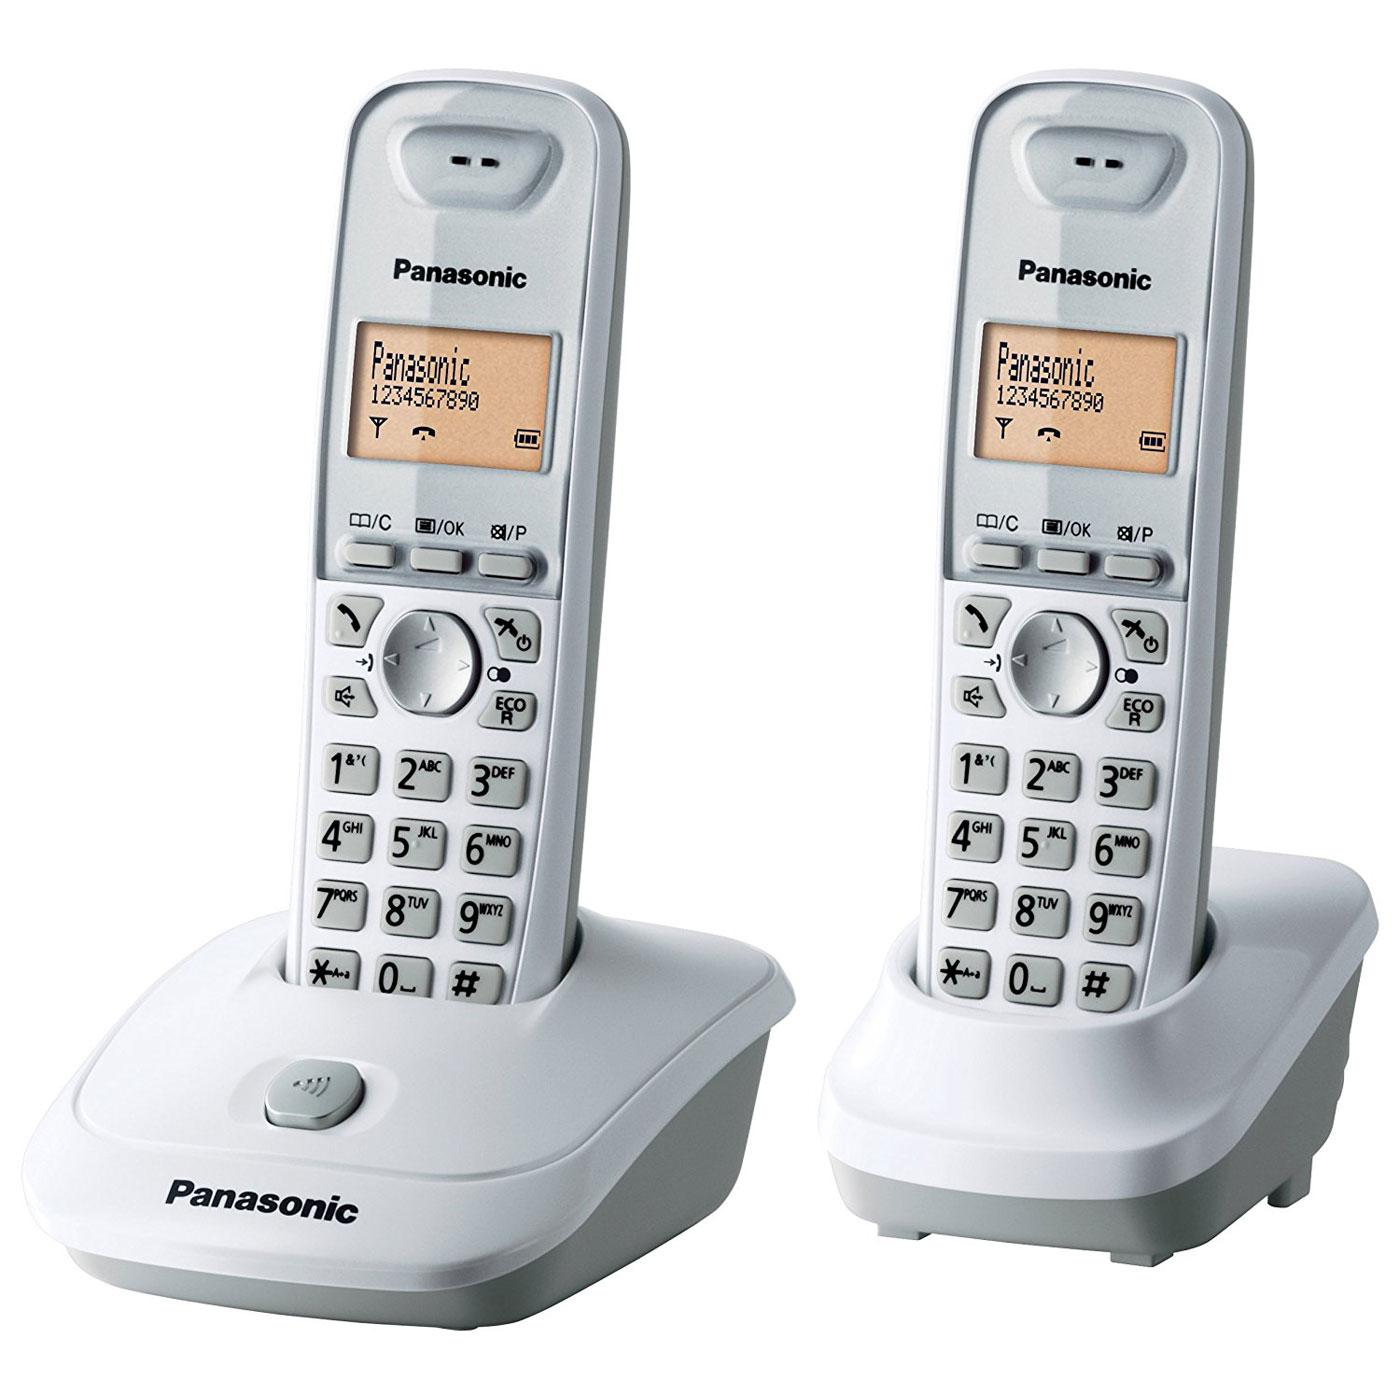 panasonic kx tg2512fr duo blanc t l phone sans fil panasonic sur. Black Bedroom Furniture Sets. Home Design Ideas